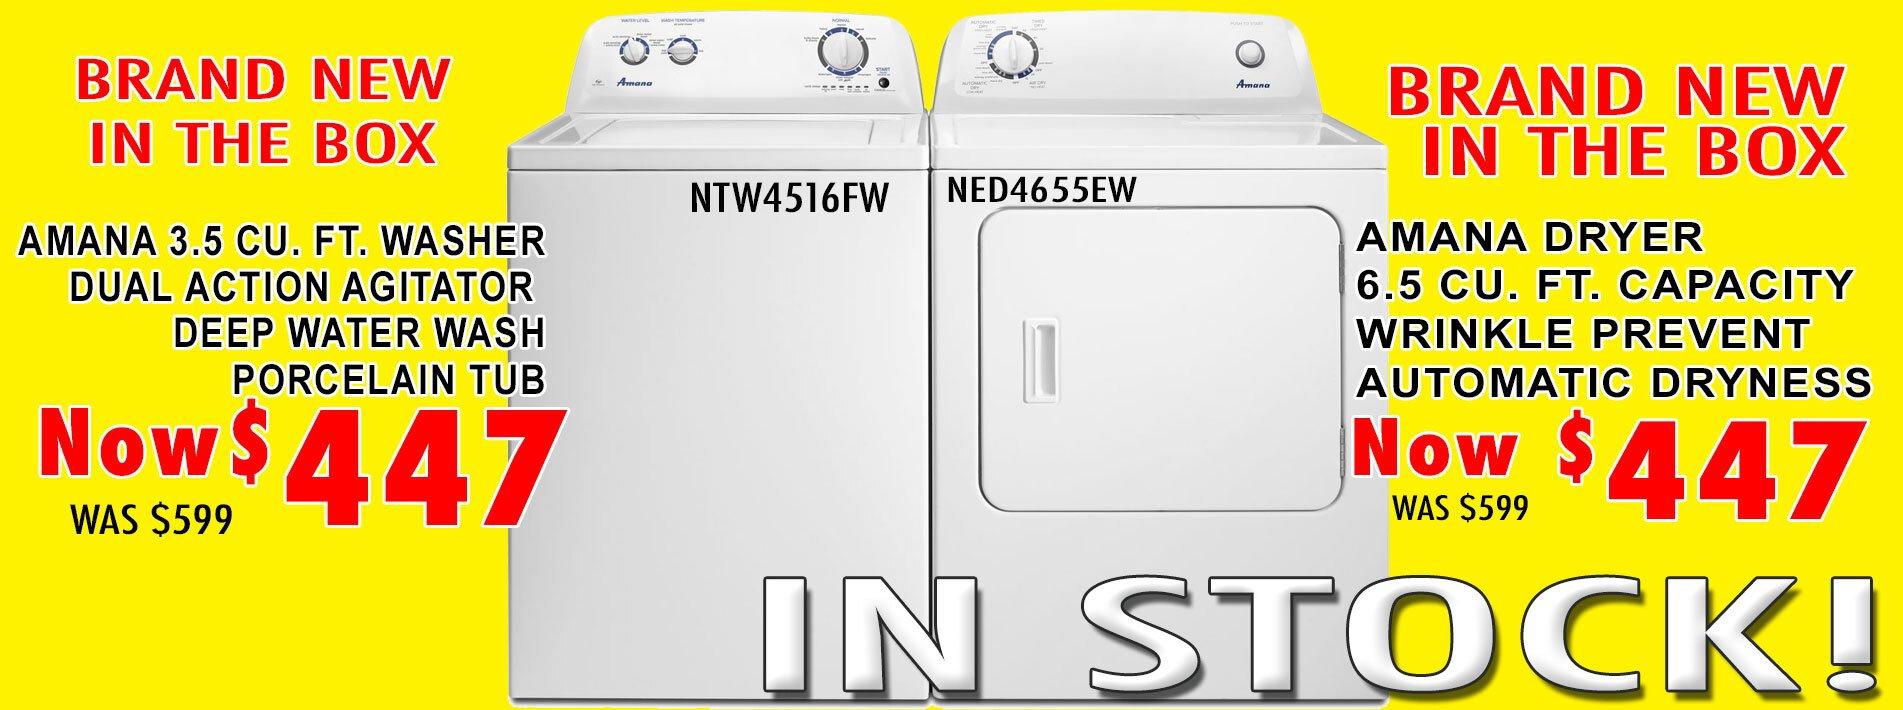 NTW4516FW NED4655EW